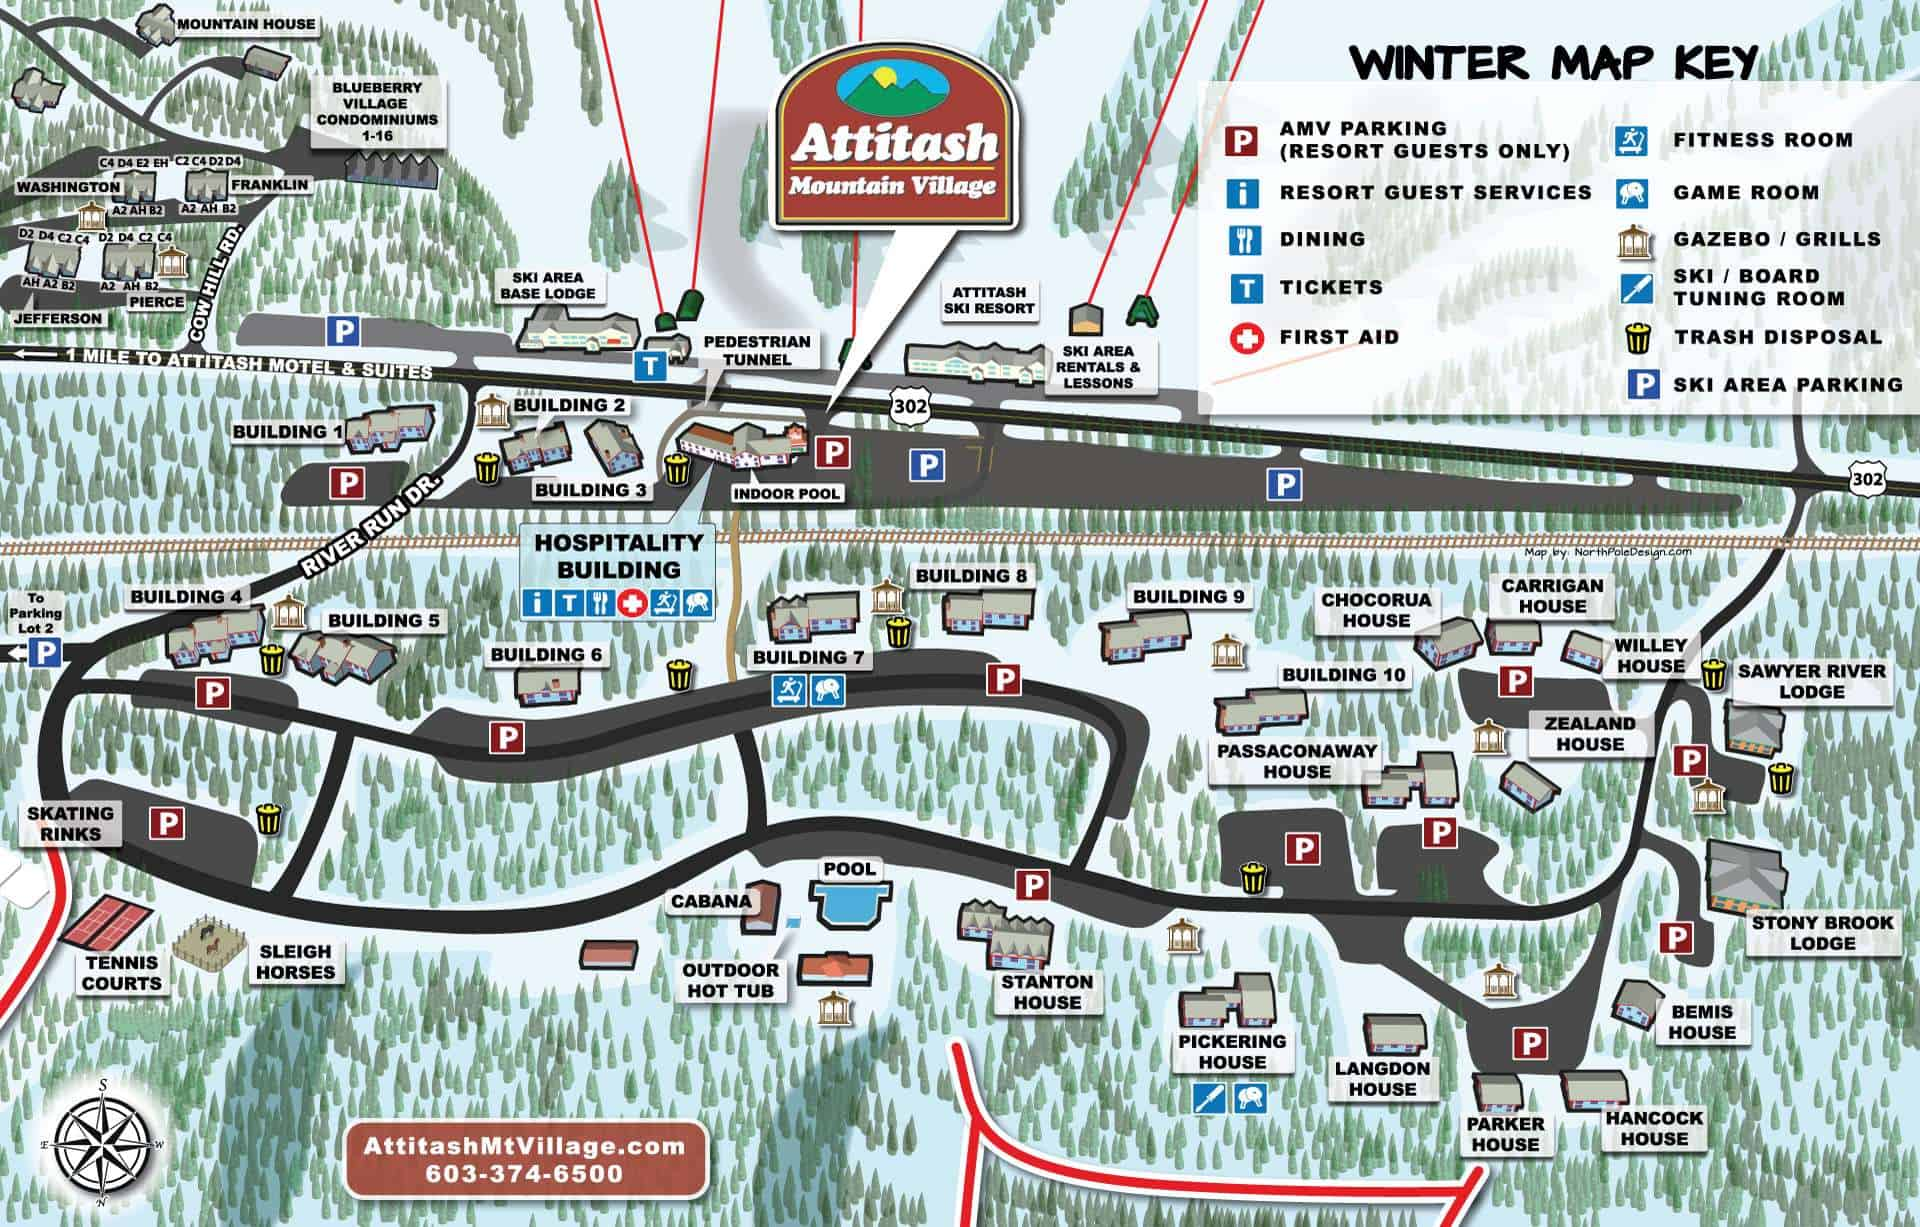 Winter resort map